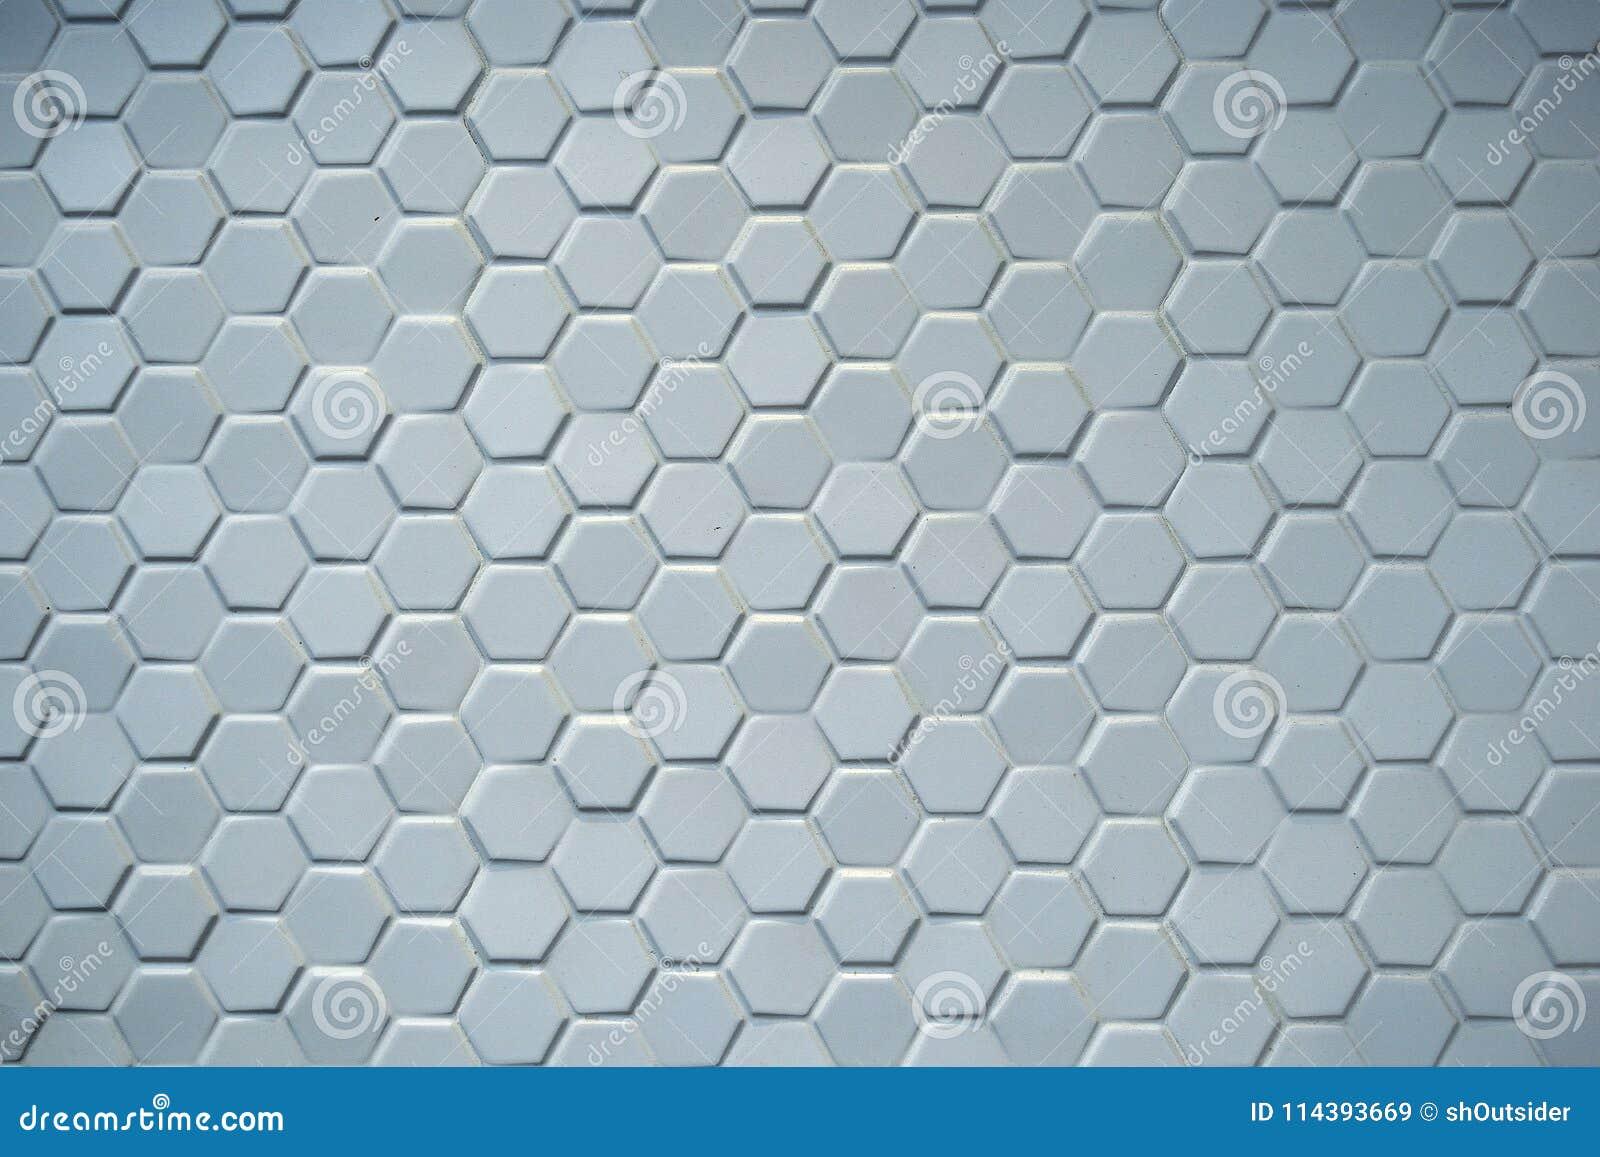 Hexagonal Ceramic Blue Tiles Stock Image - Image of blue, texture ...